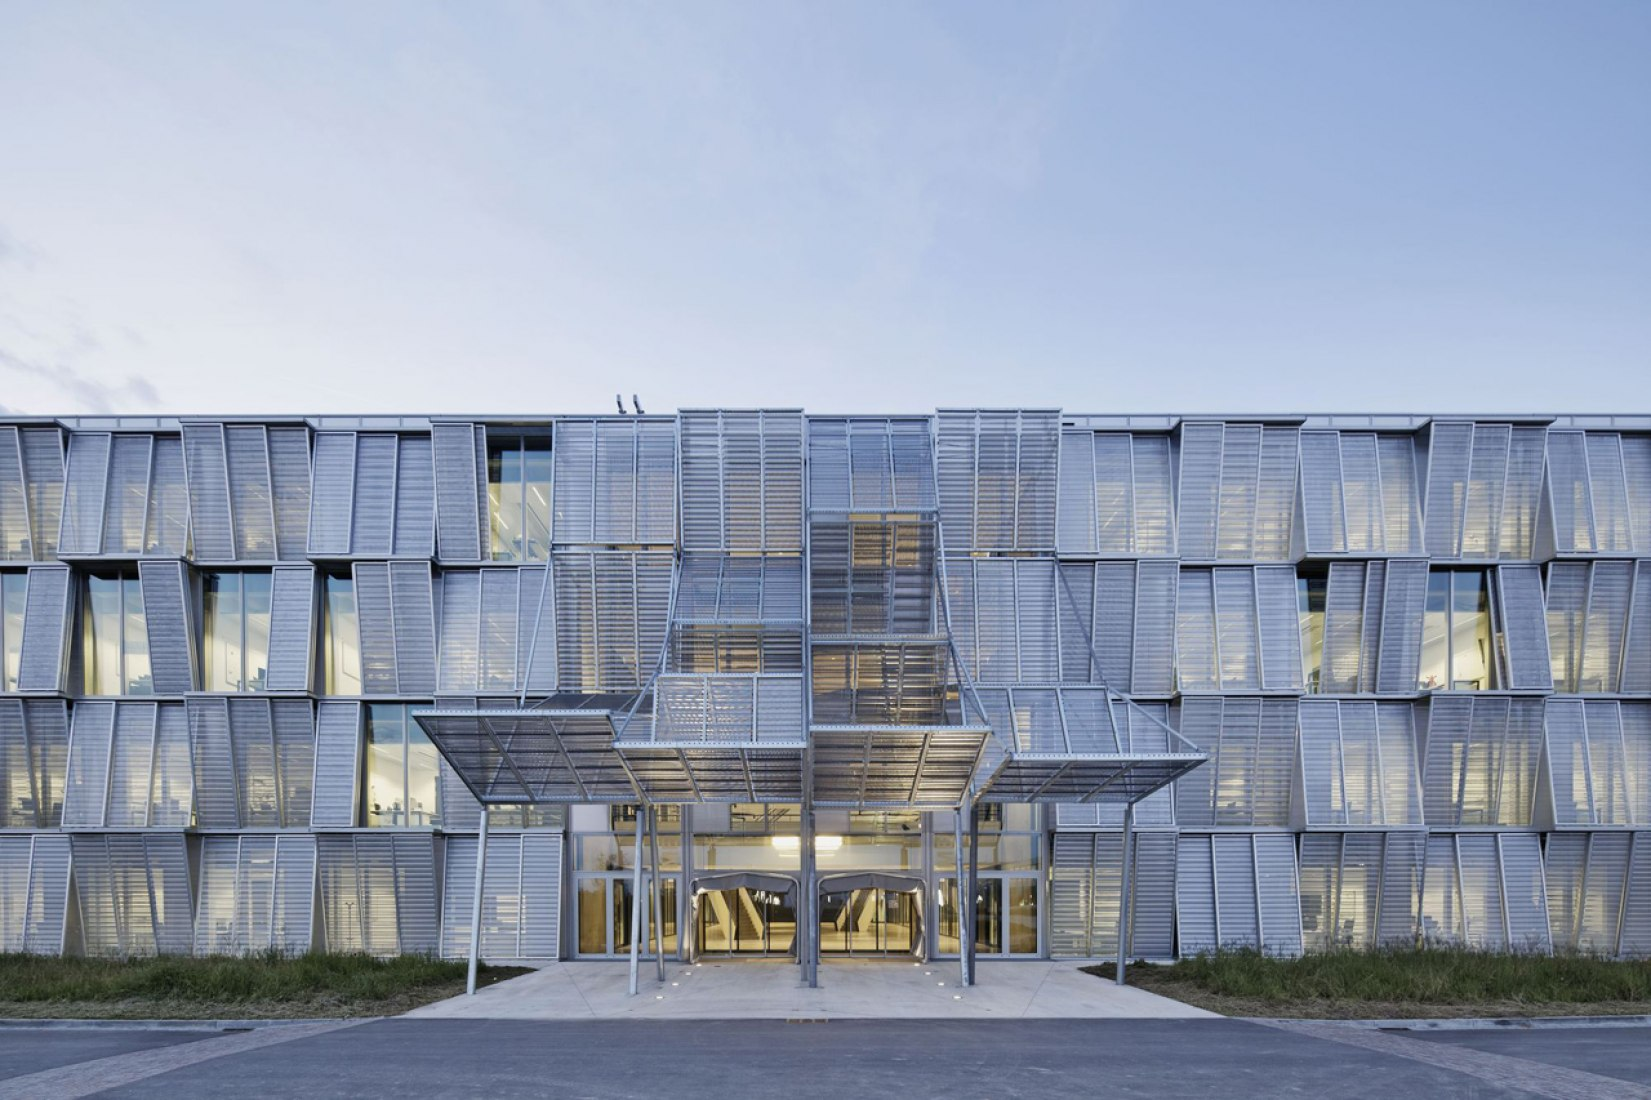 Access. New Mechanics hall (ME) by Dominique Perrault. Photograph © Vincent Fillon